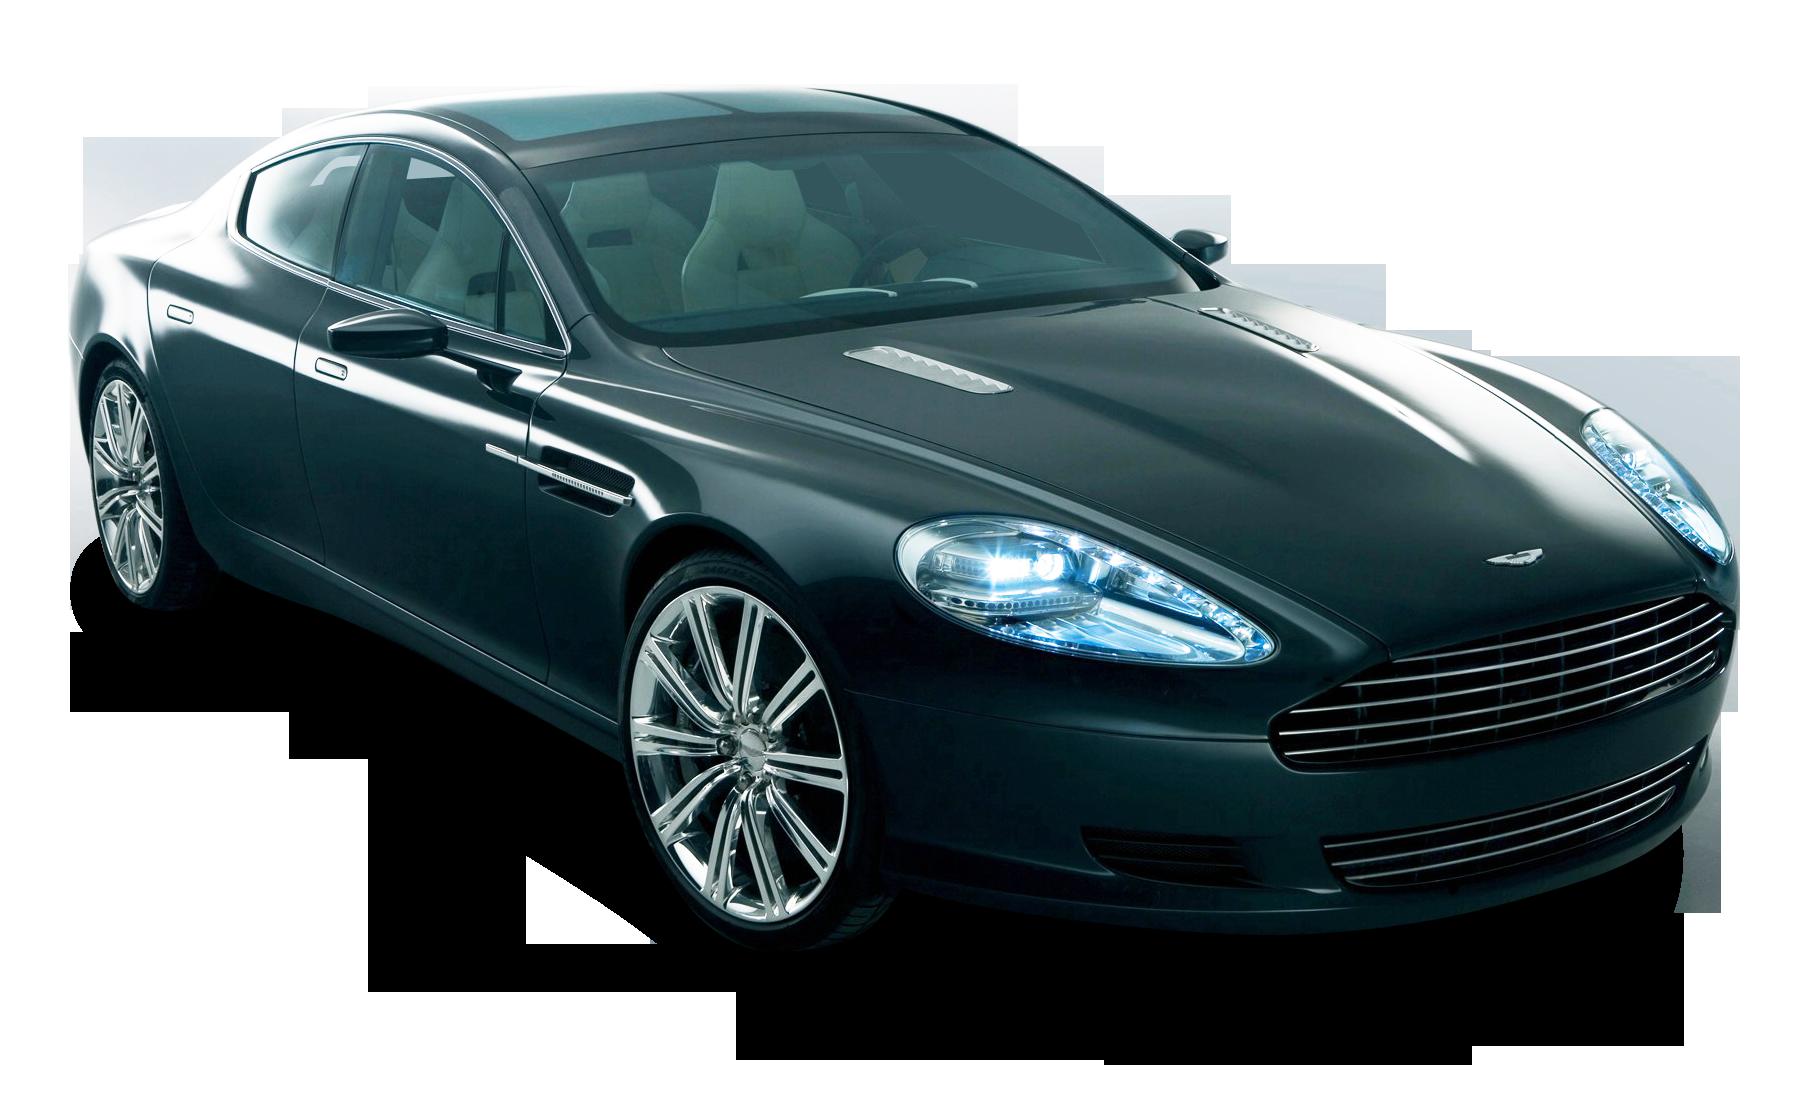 Blue Aston Martin Rapide Car PNG Image